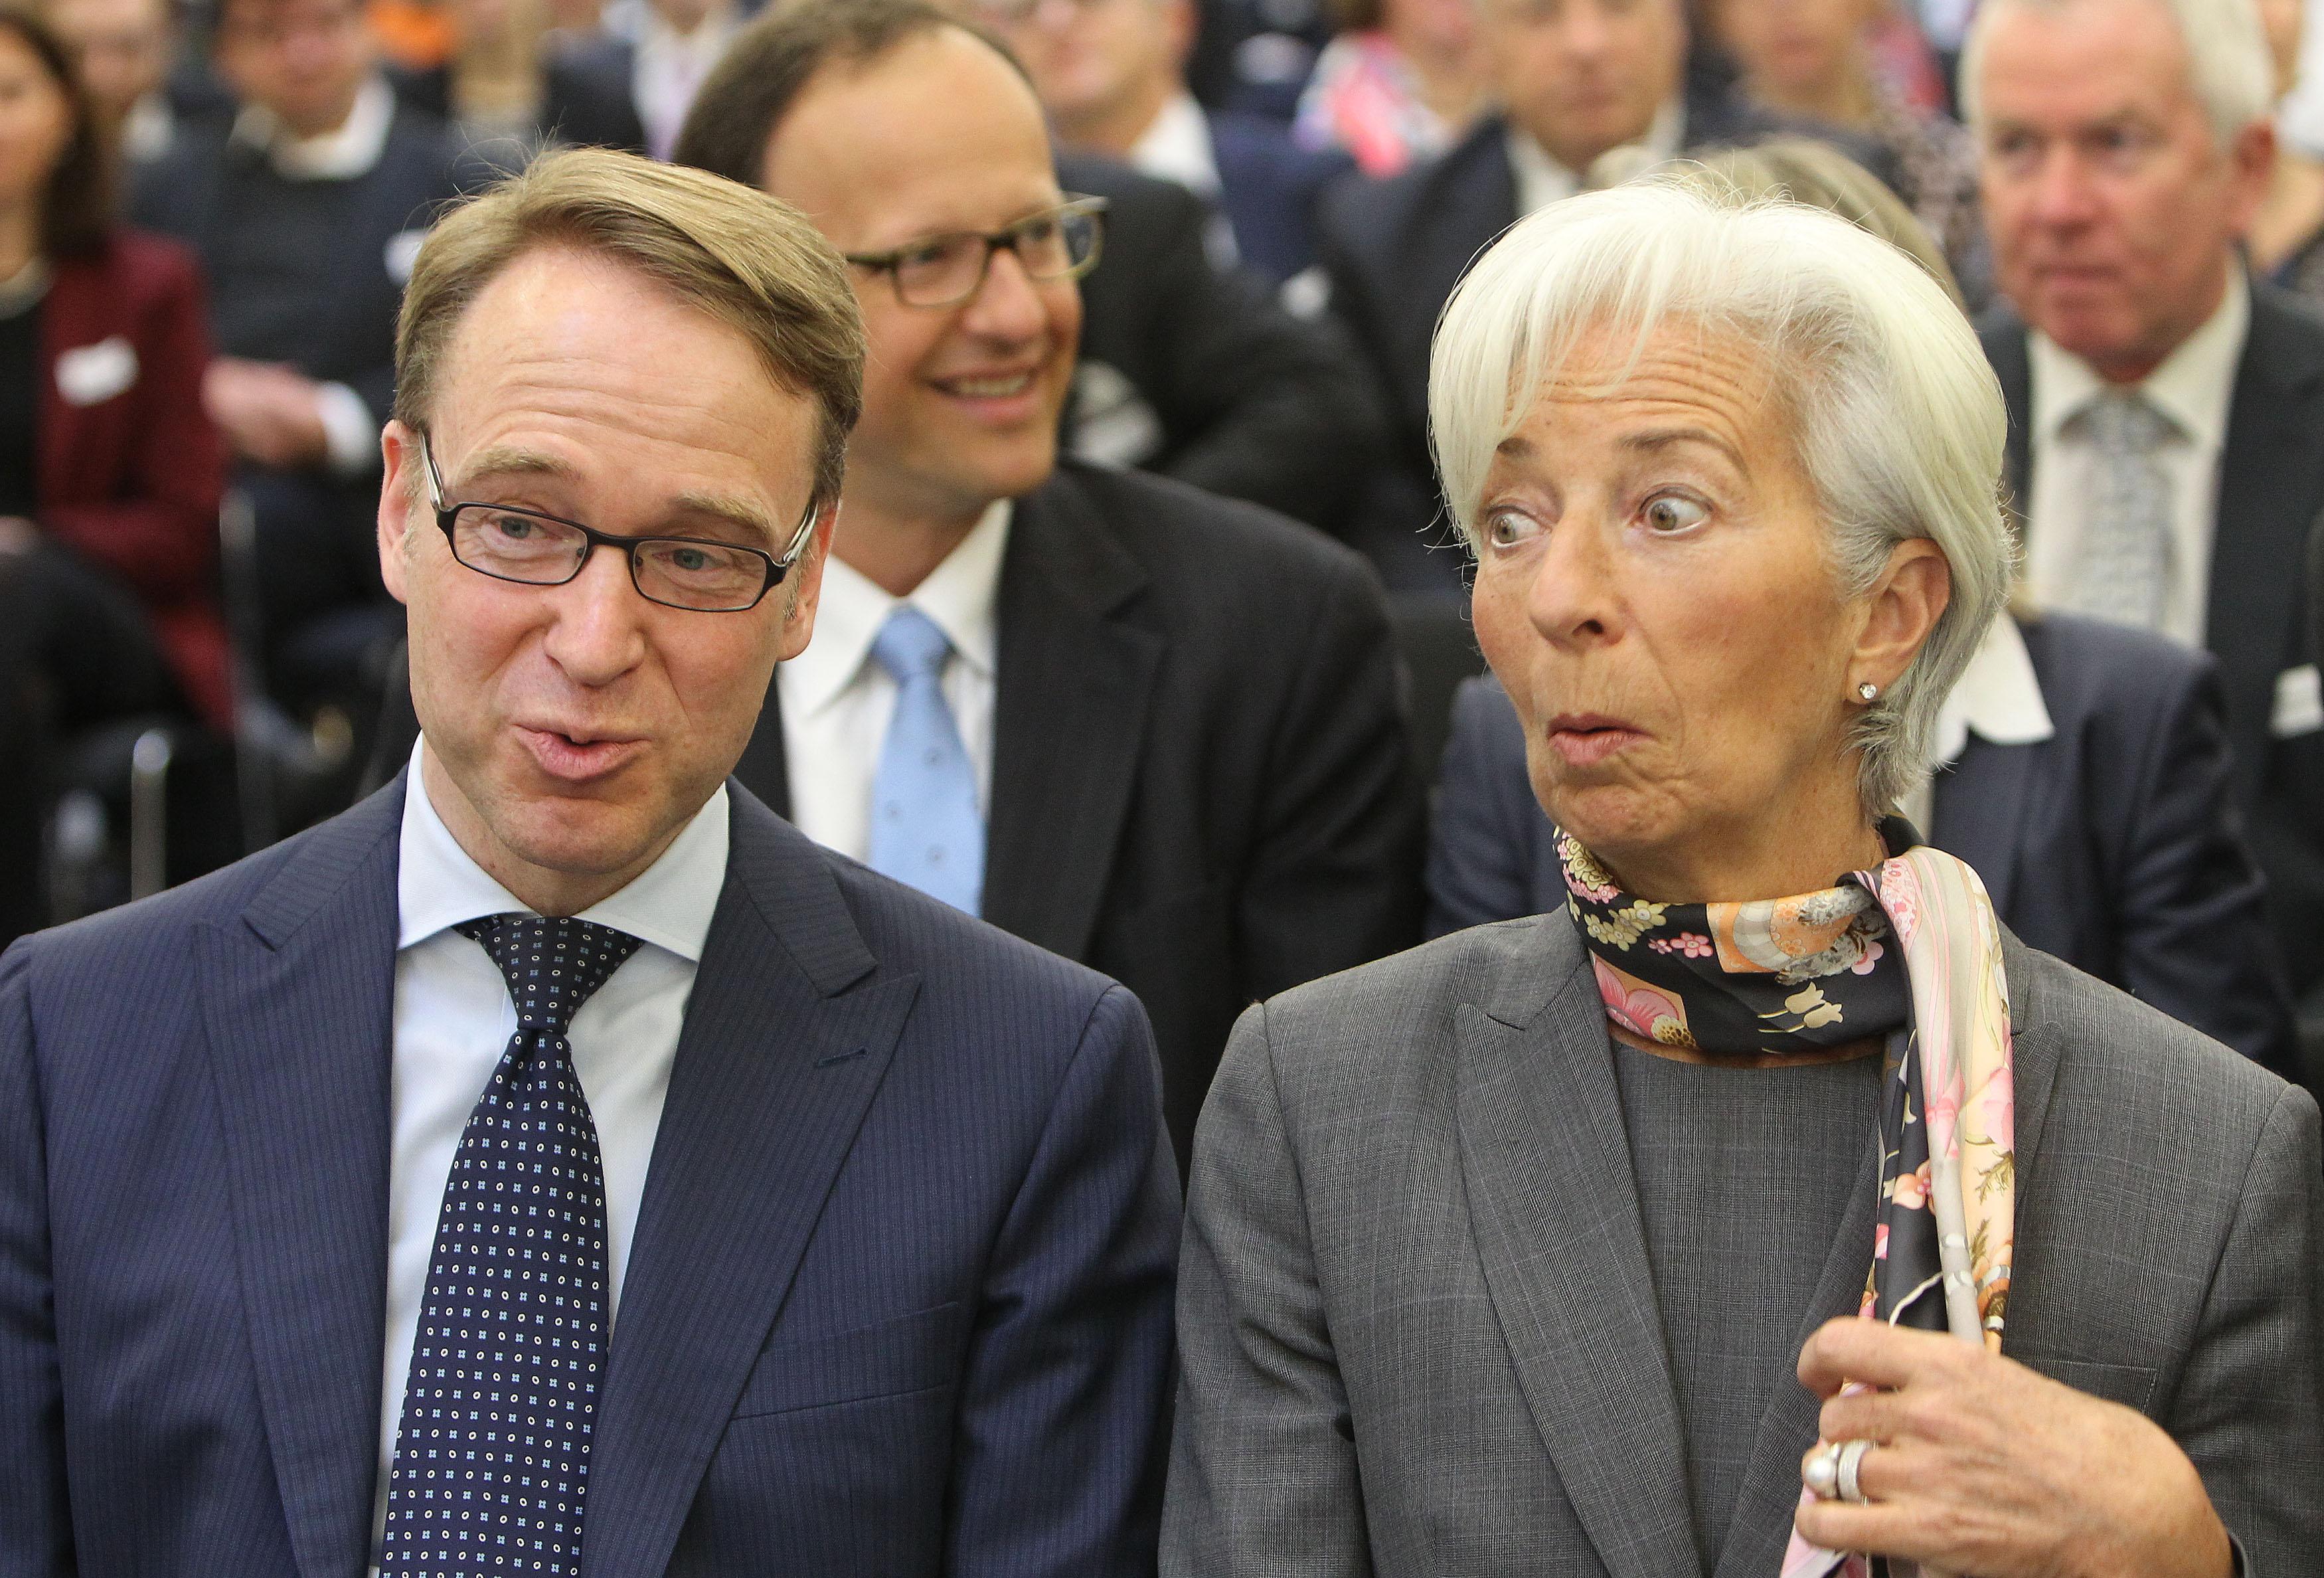 Germany Chooses Economic Nostalgia Over Saving the Planet